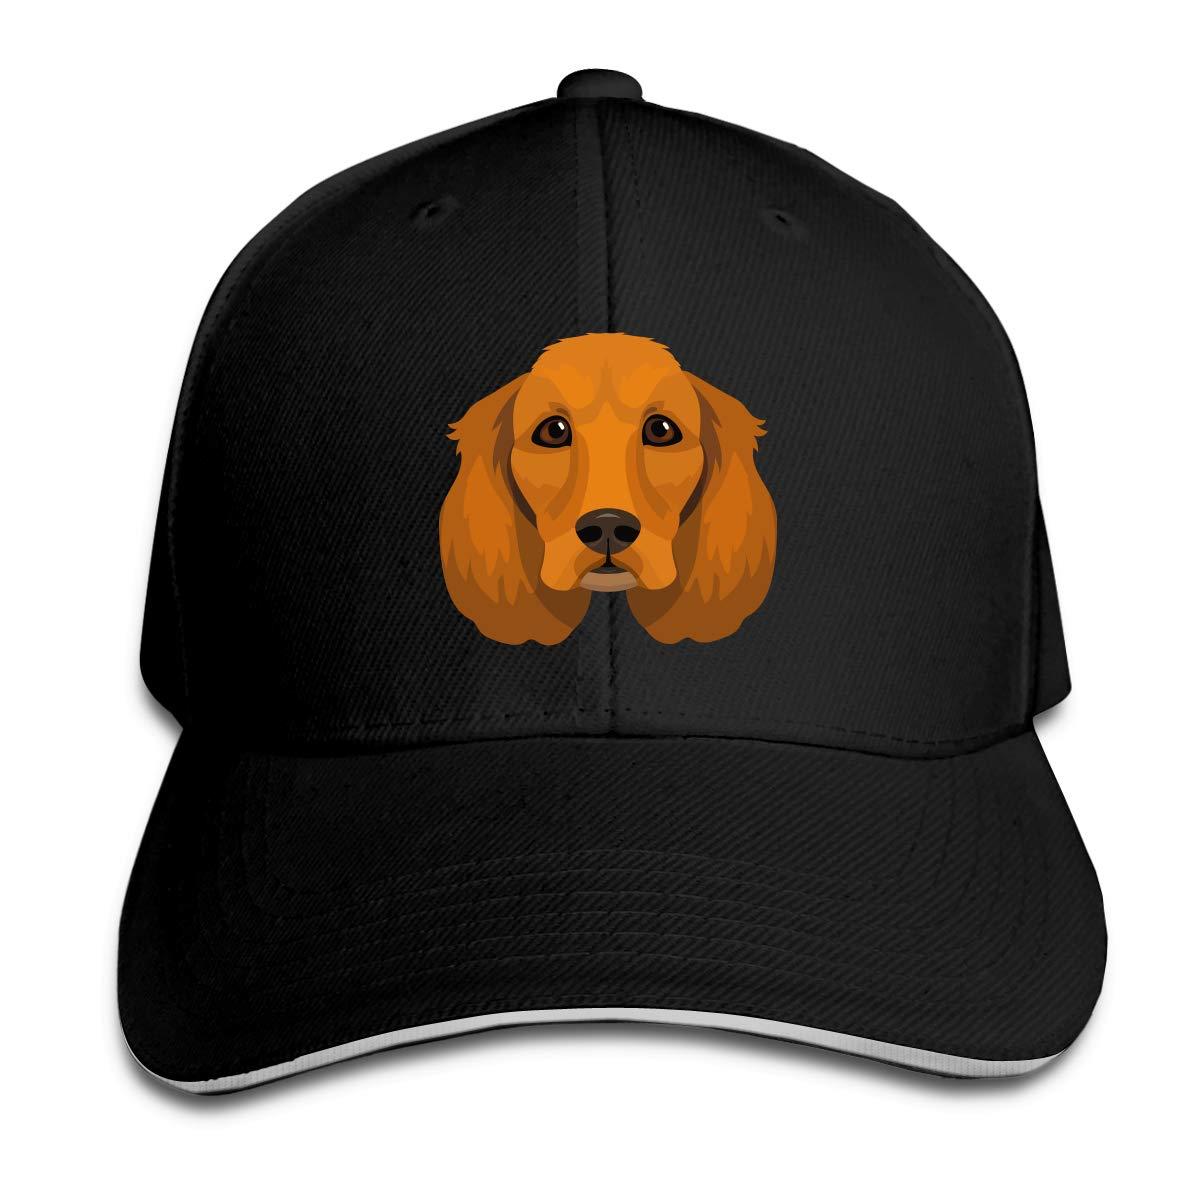 WFIRE Adult Baseball Caps Spaniel Custom Adjustable Sandwich Cap Casquette Hats